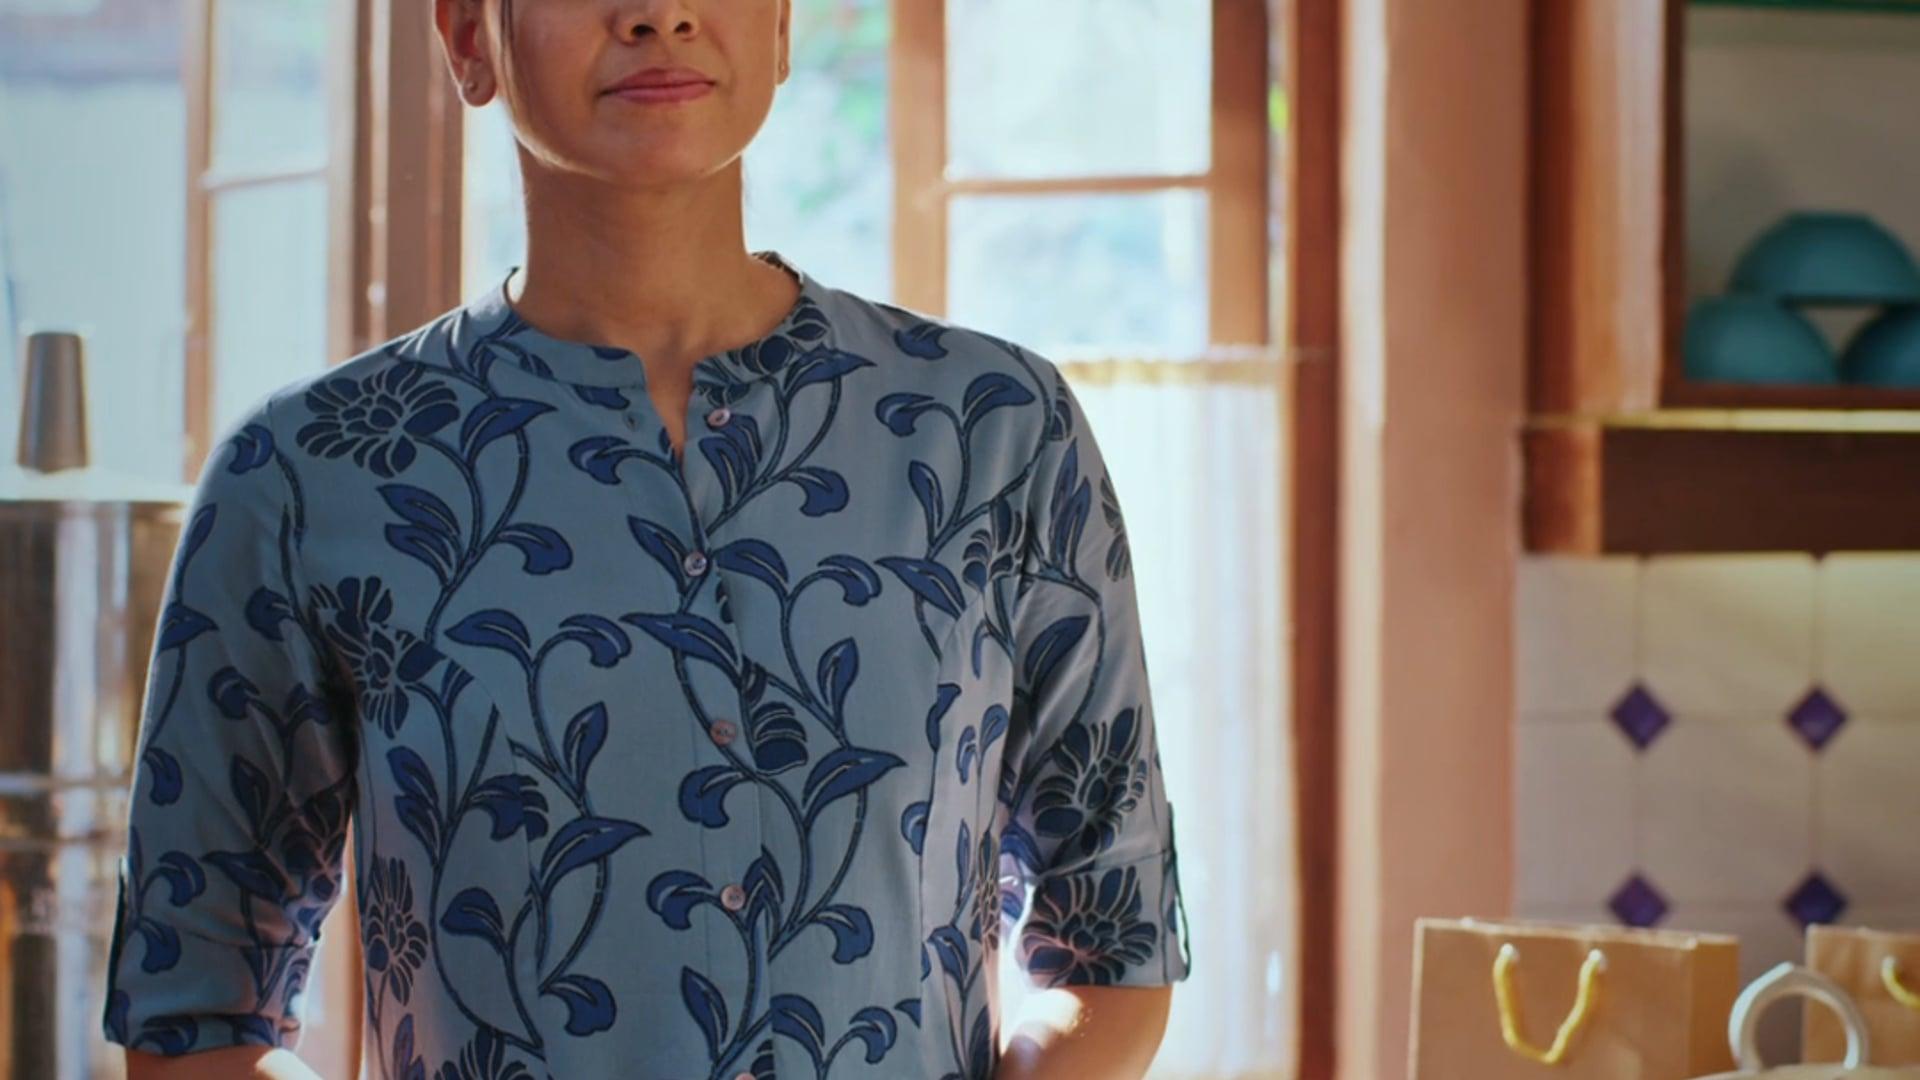 HDFC | Women's Day | Vertical Film